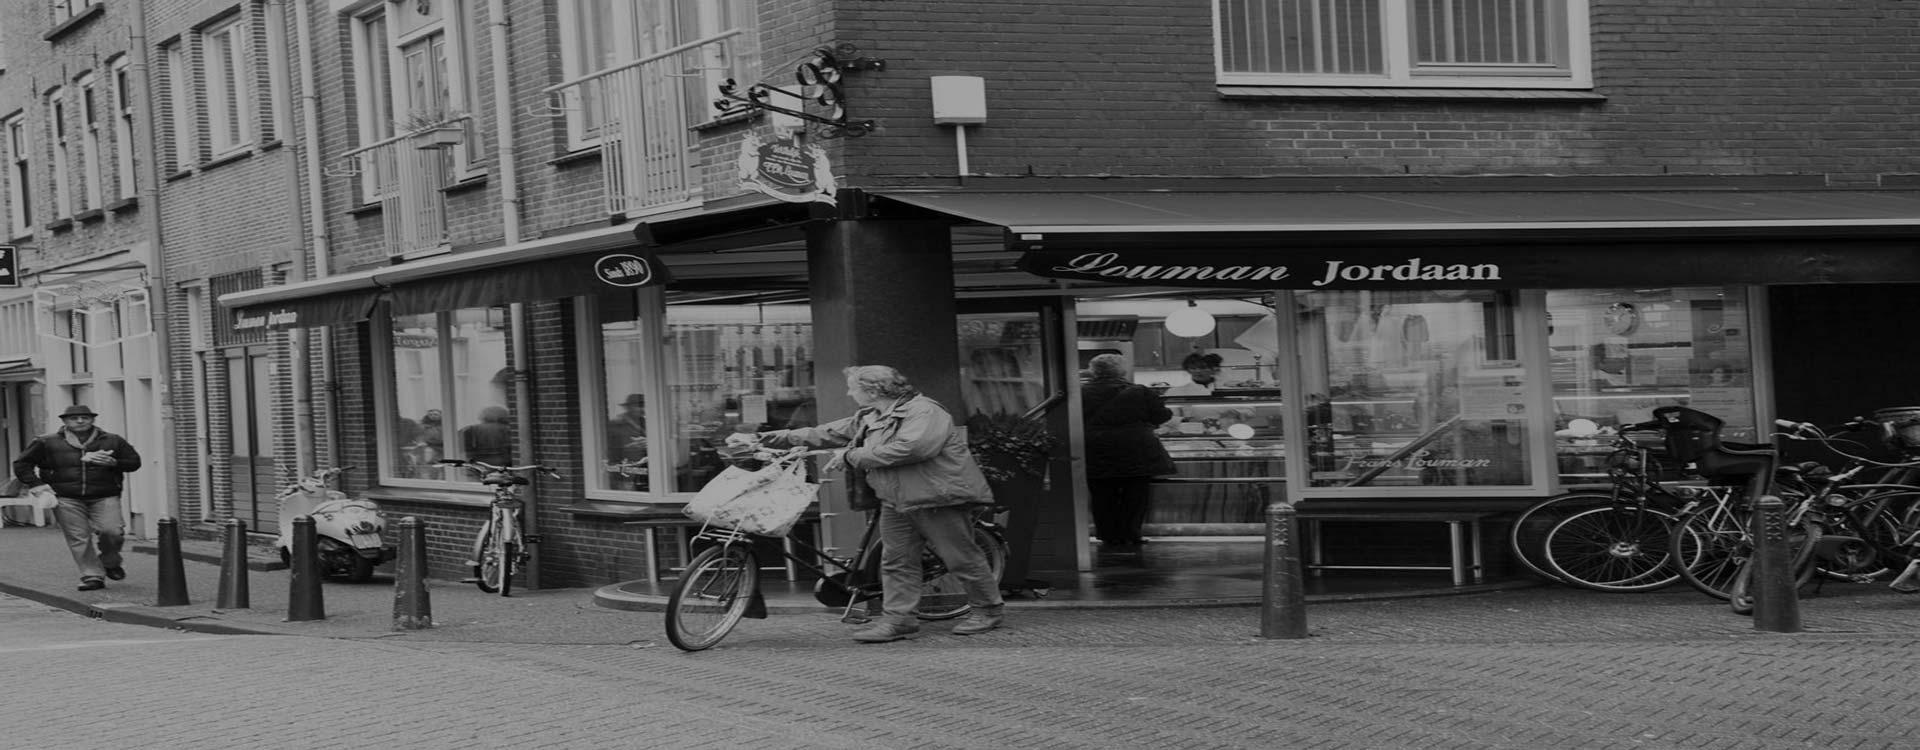 Louman-Jordaan--Online-Slager-Amsterdam